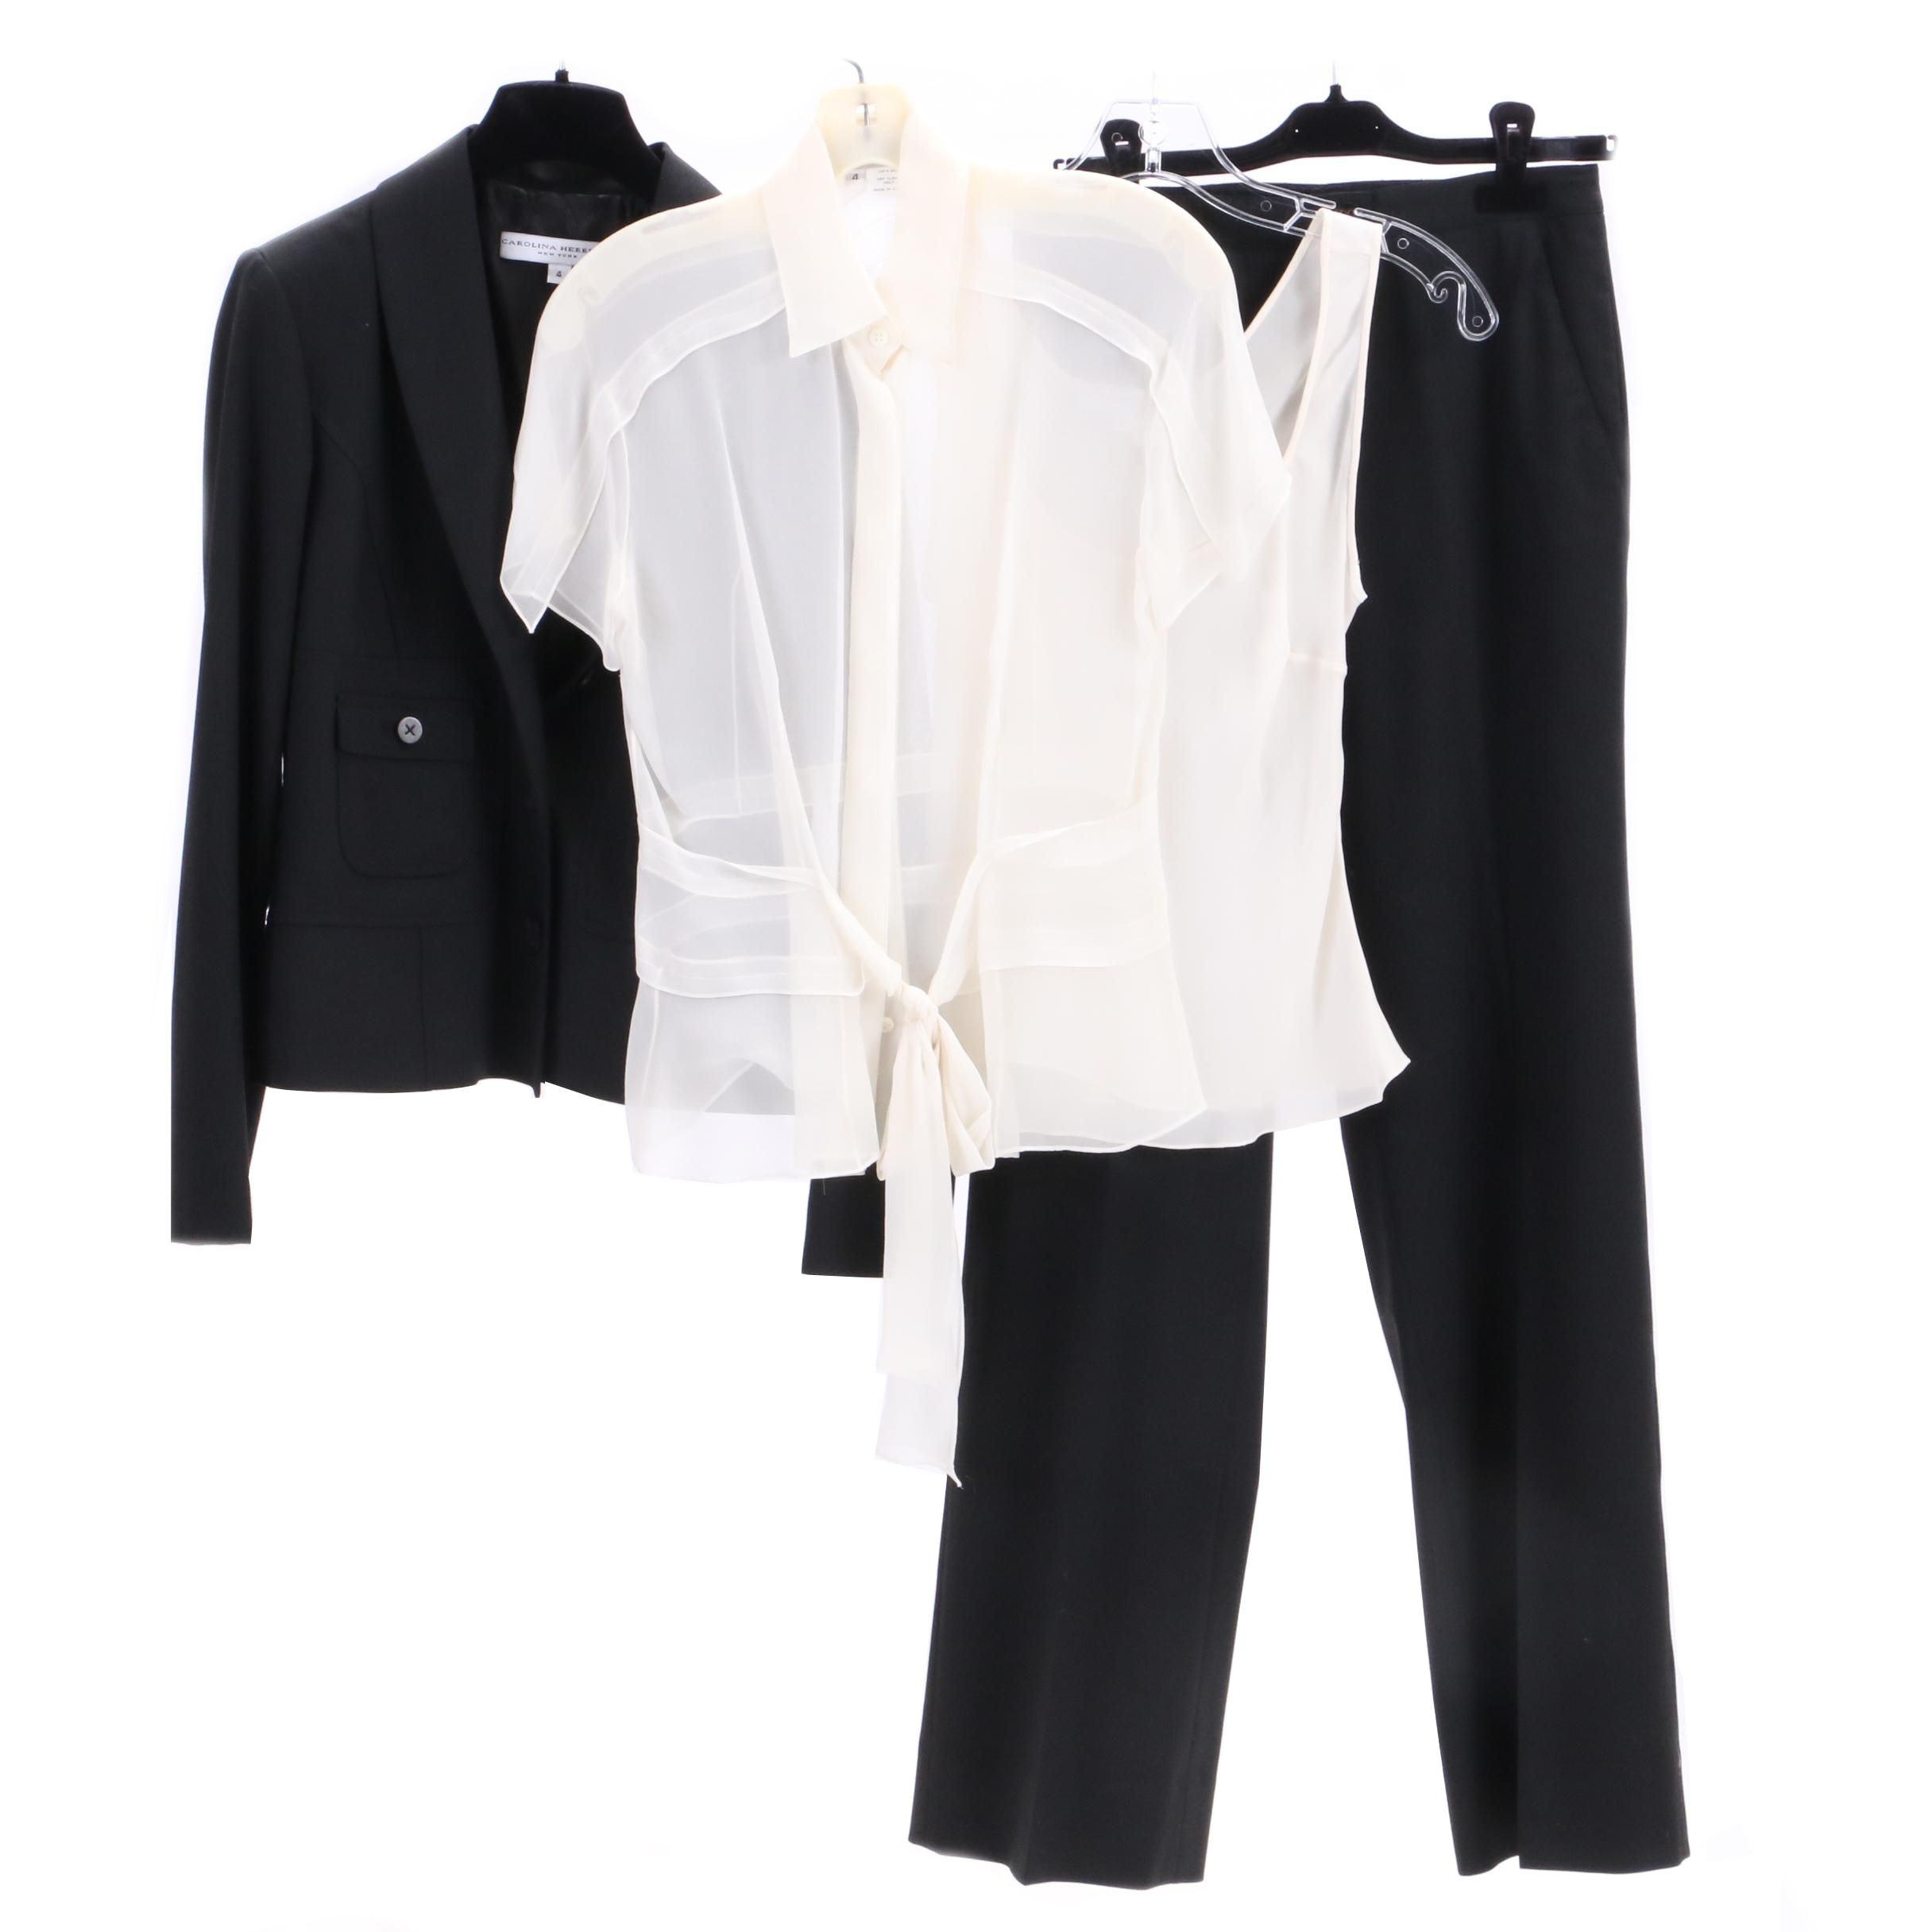 Carolina Herrera Wool Blend Suit with Silk Blouses